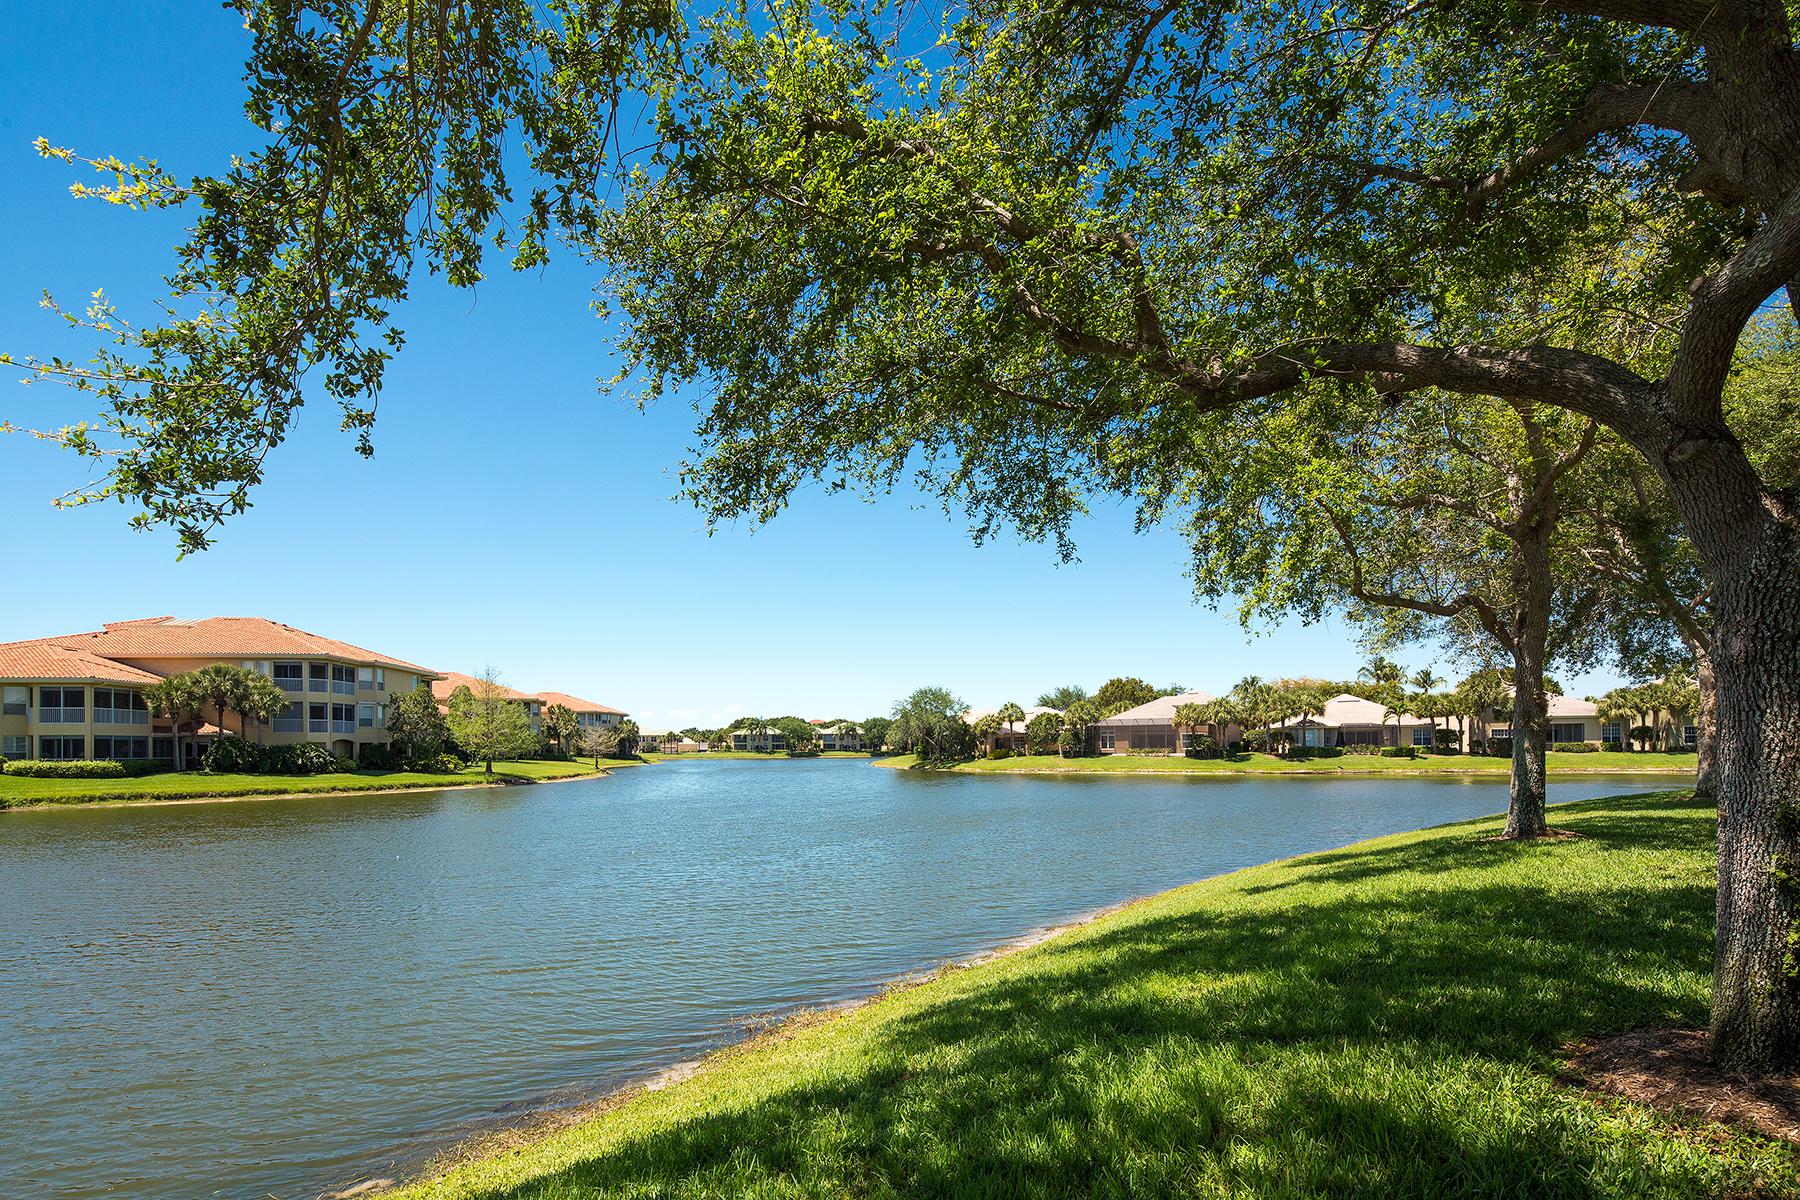 Condominium for Sale at PELICAN MARSH - RAVENNA 2414 Ravenna Blvd 202, Naples, Florida 34109 United States